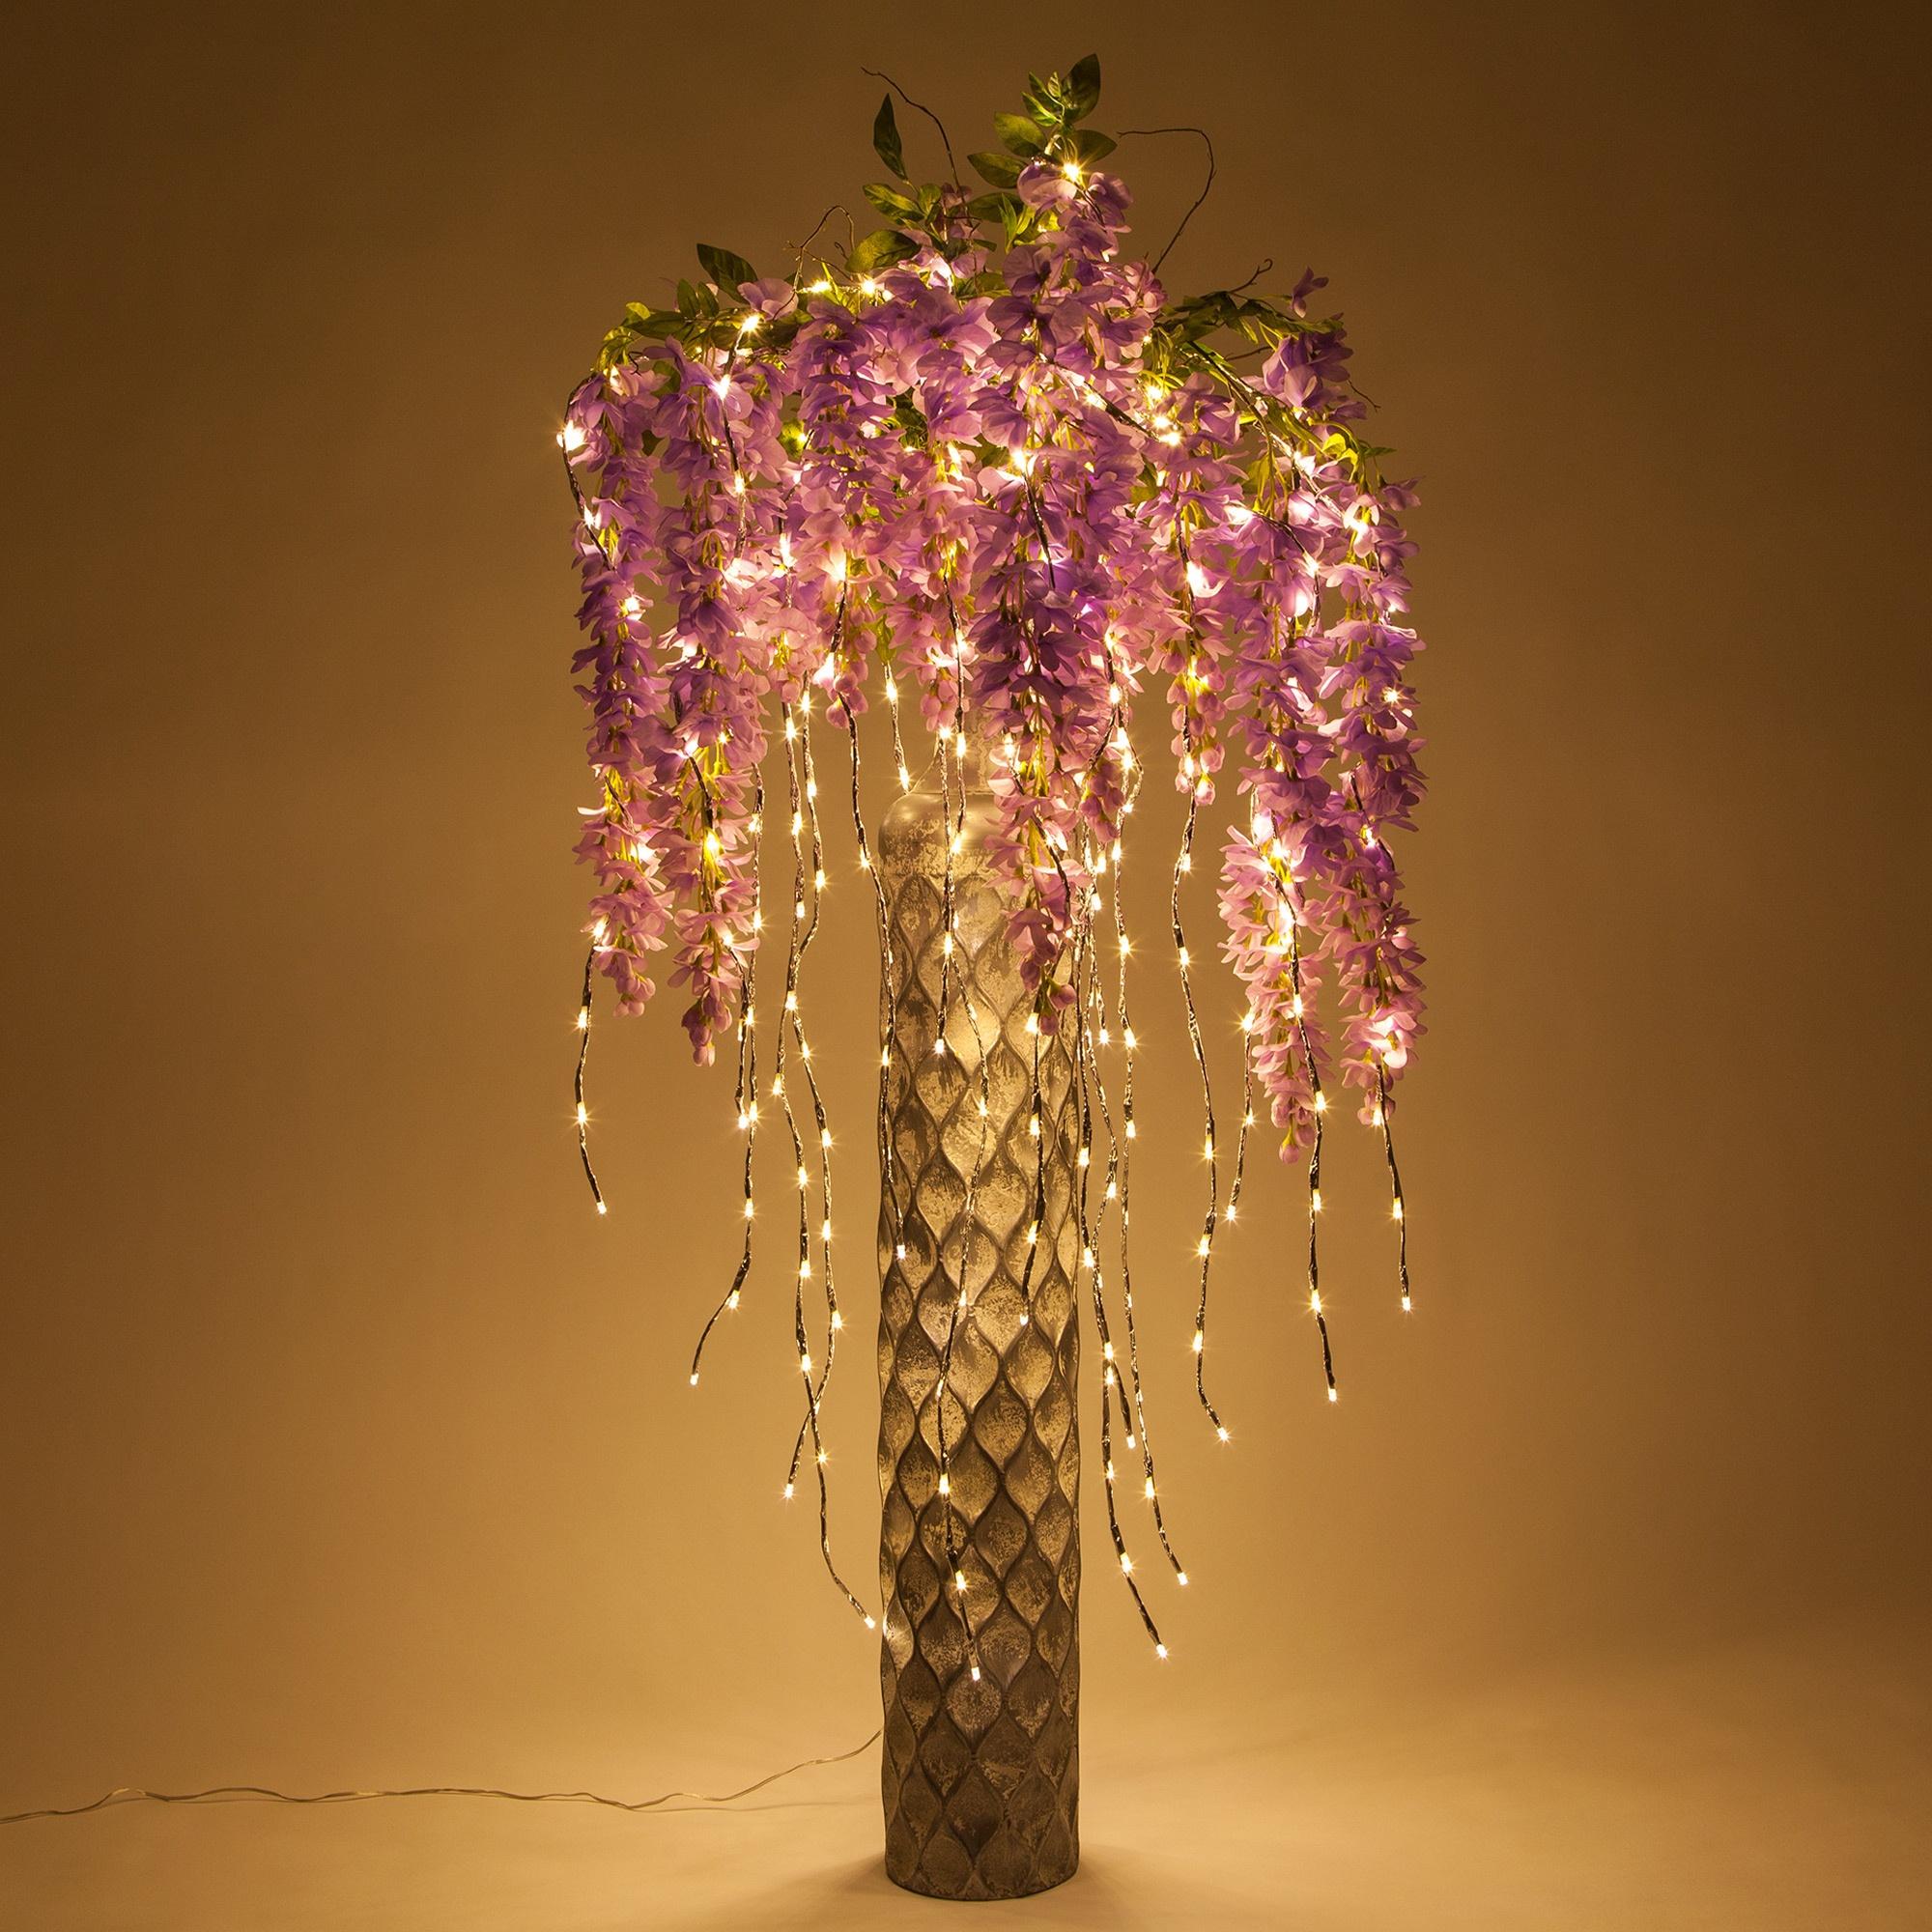 Pink Flowers Lighted Branch Vase Decor